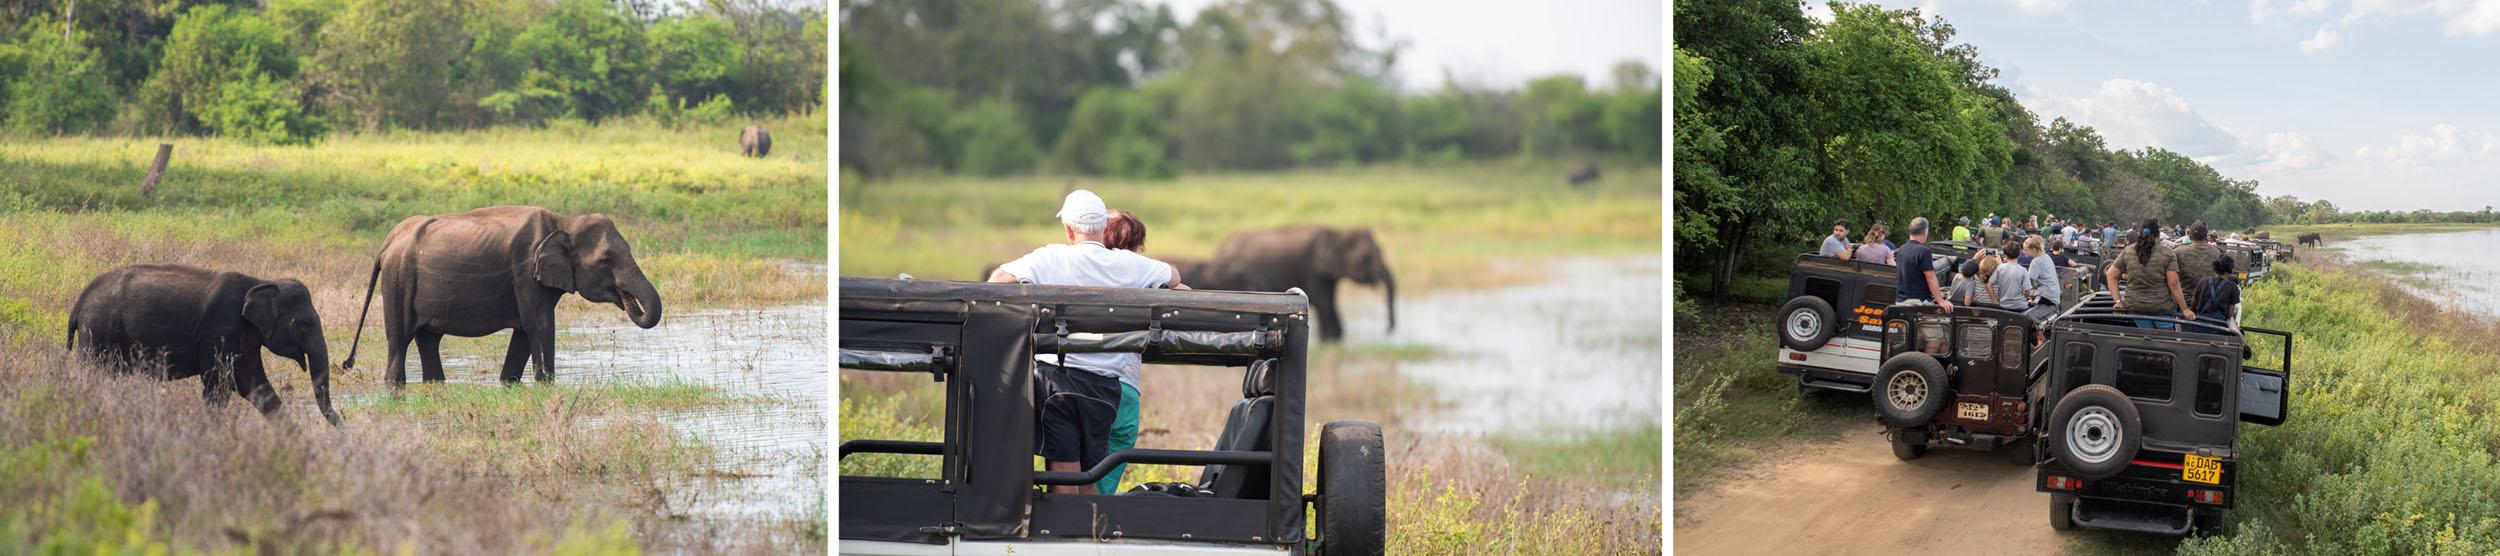 Drieluik van safari: olifanten in Sri Lanka